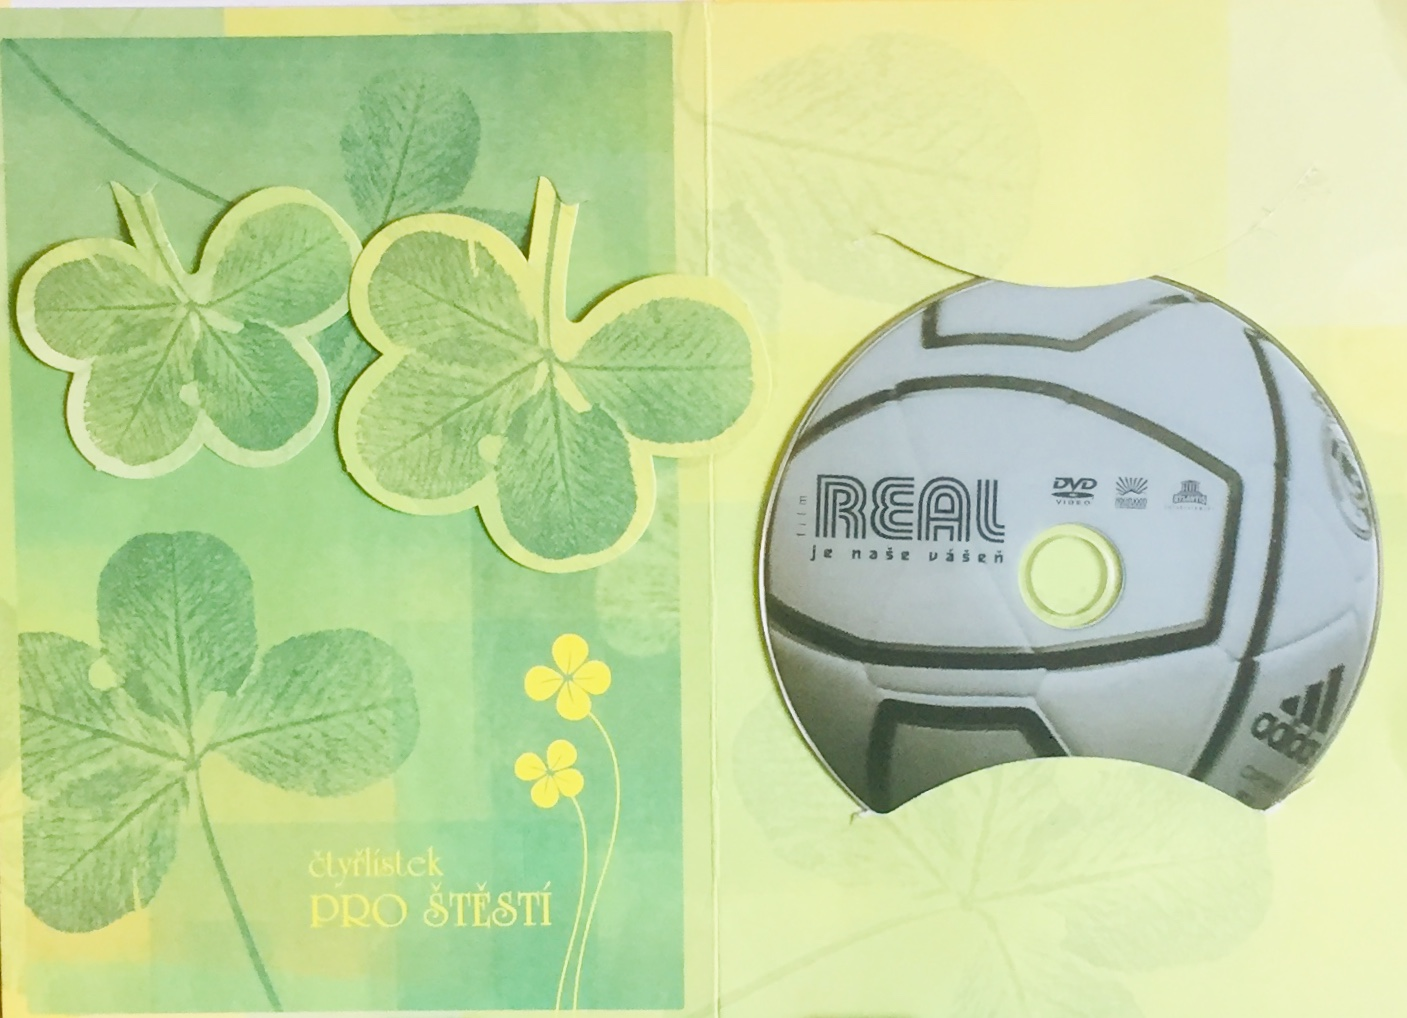 Real je naše vášeň - DVD /dárkový obal/